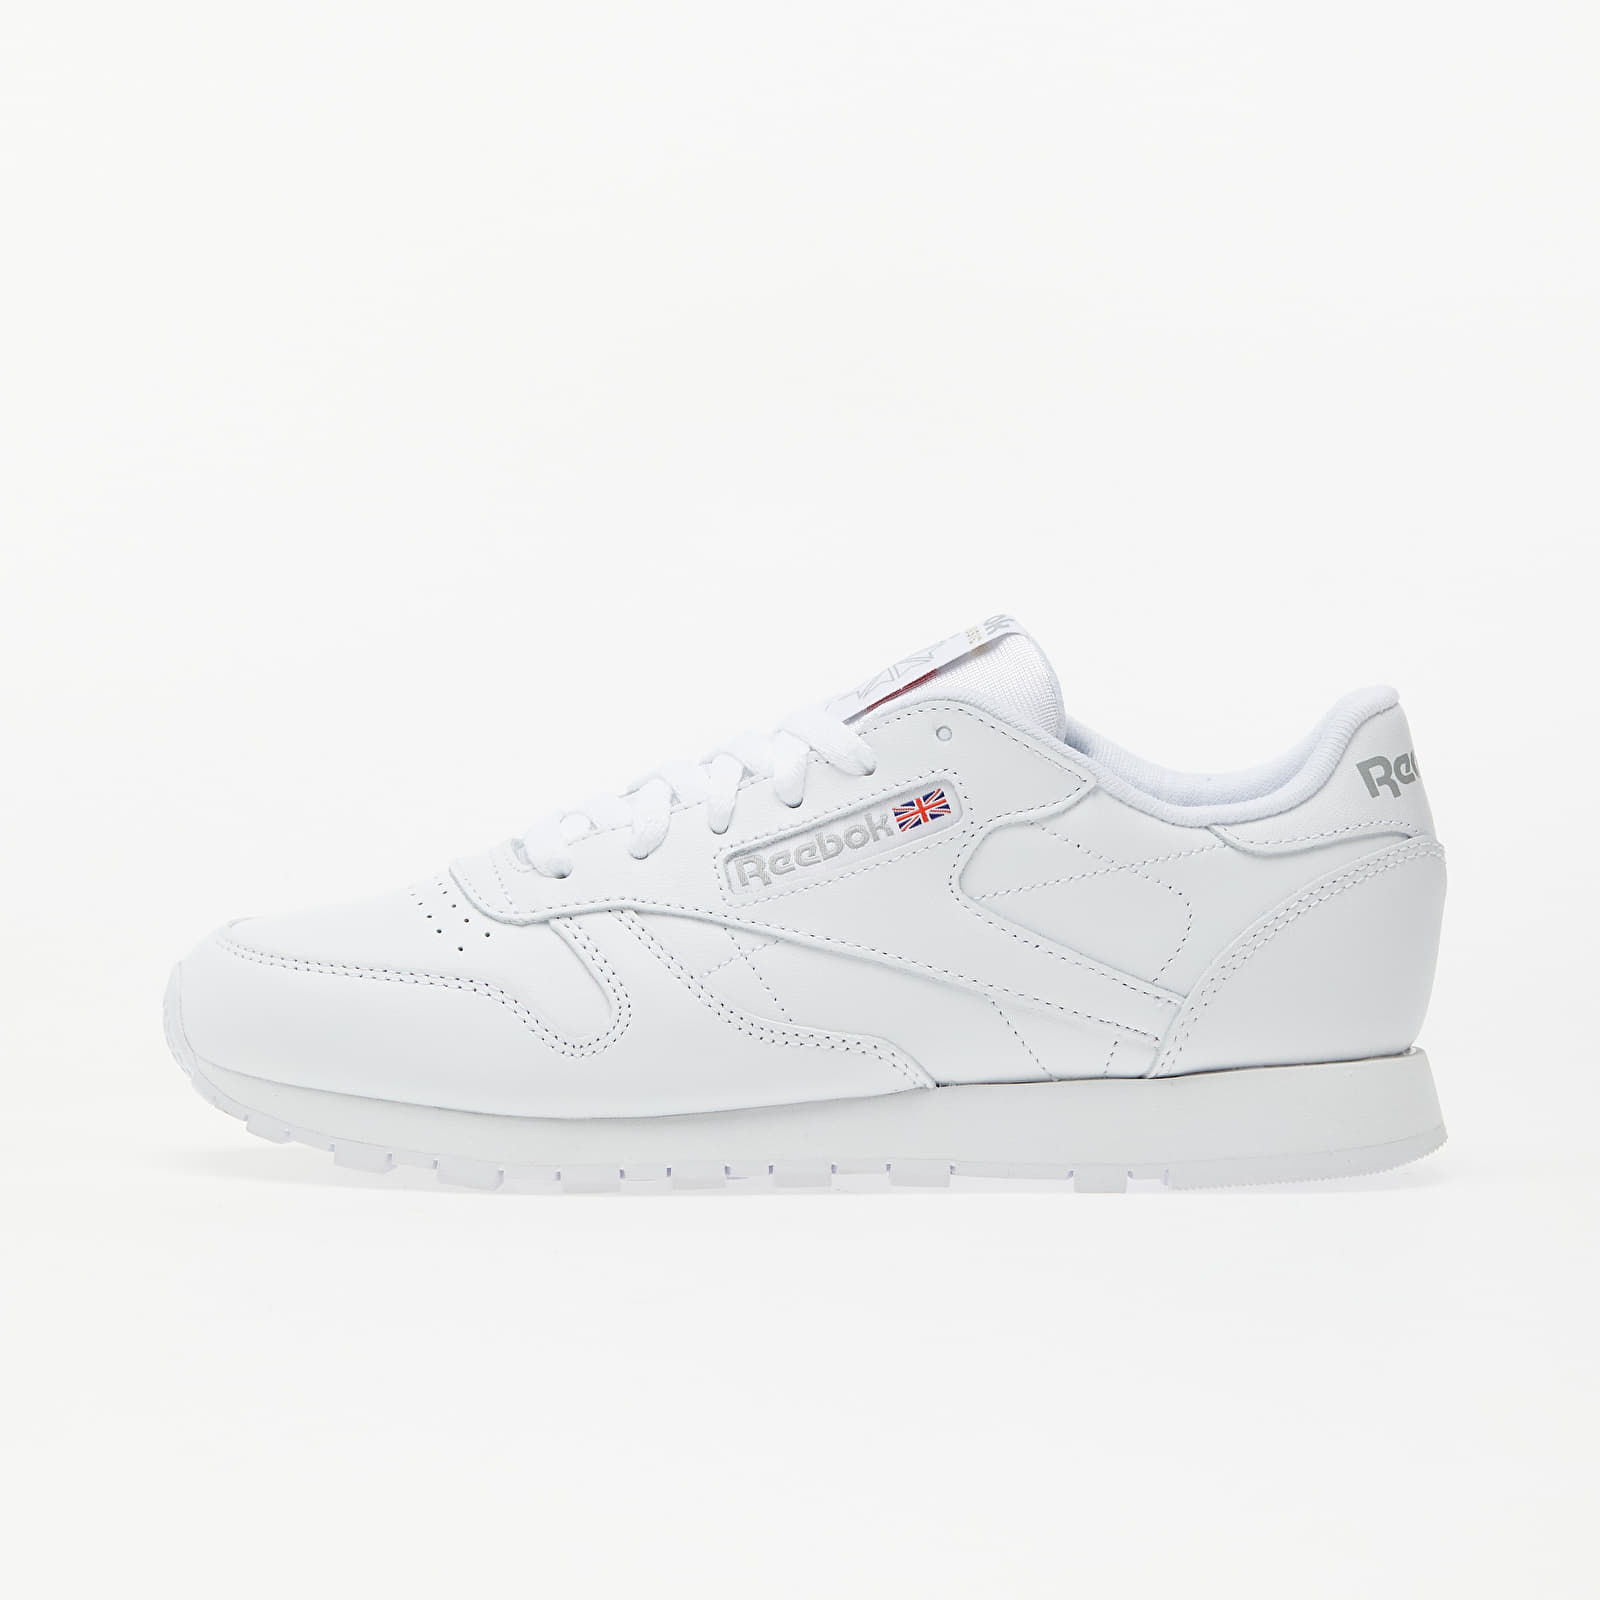 Reebok Classic Leather White EUR 37.5